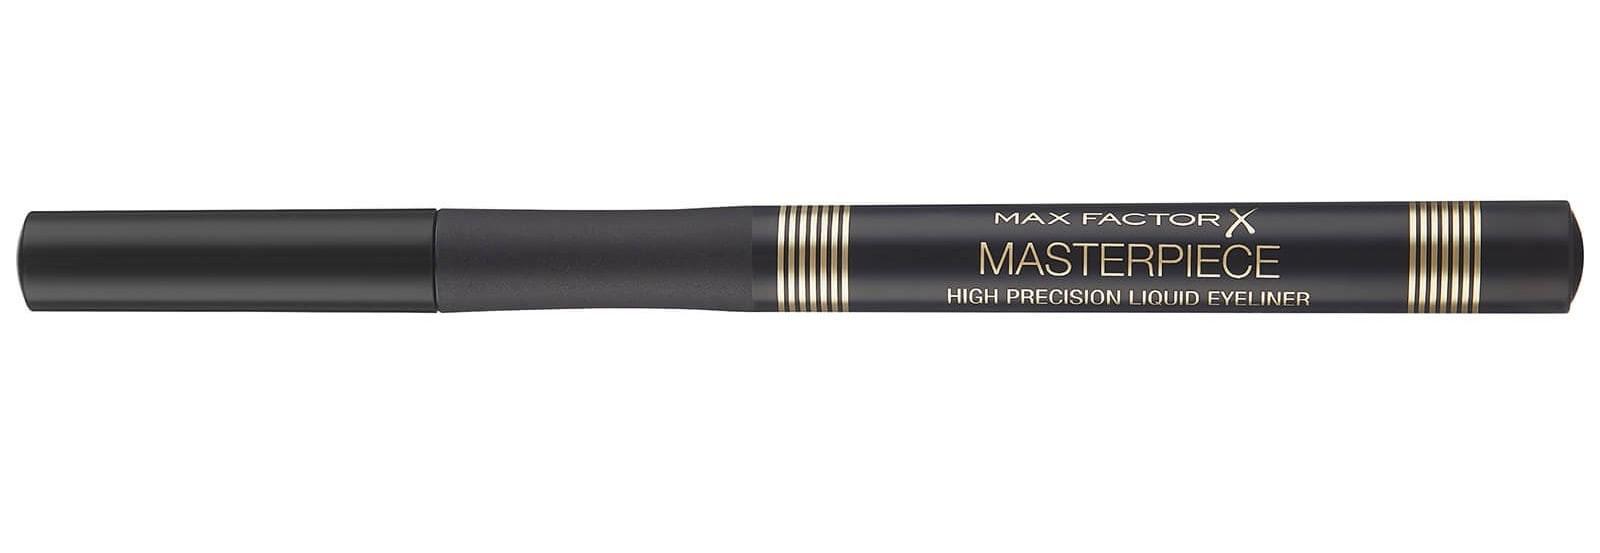 Max Factor Masterpiece High Precision Liquid Eye Liner.